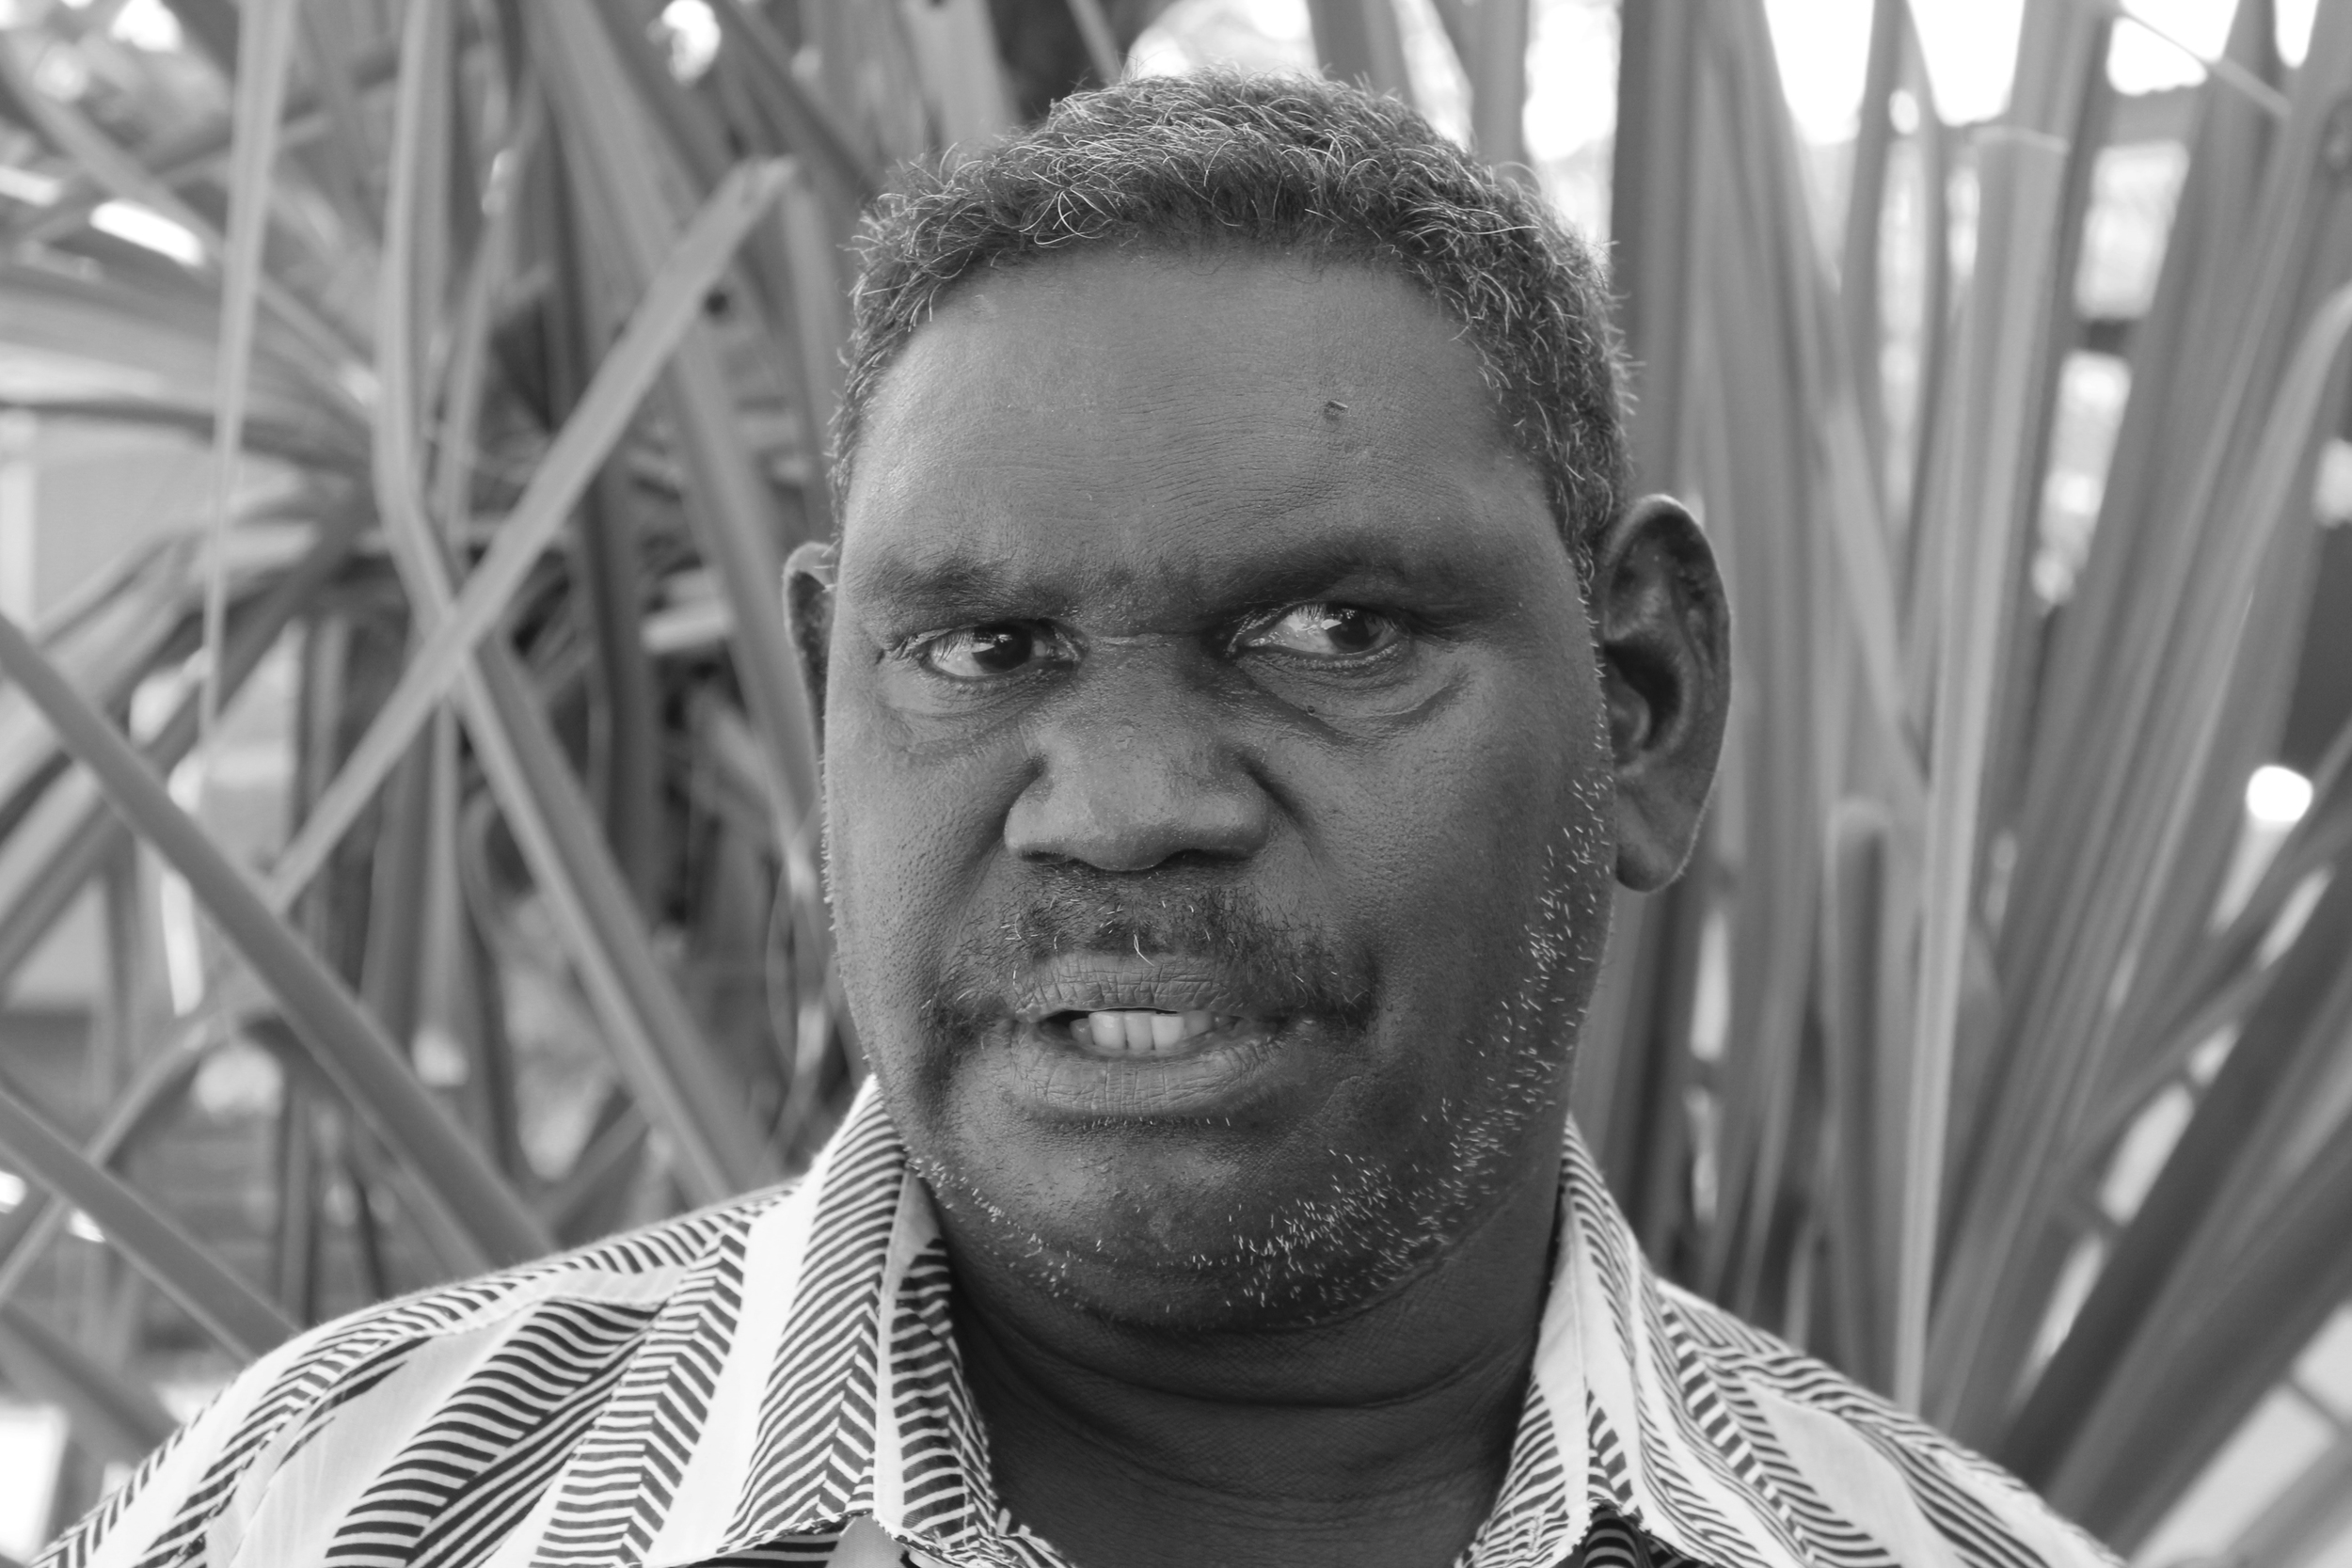 Wukun Wanambi